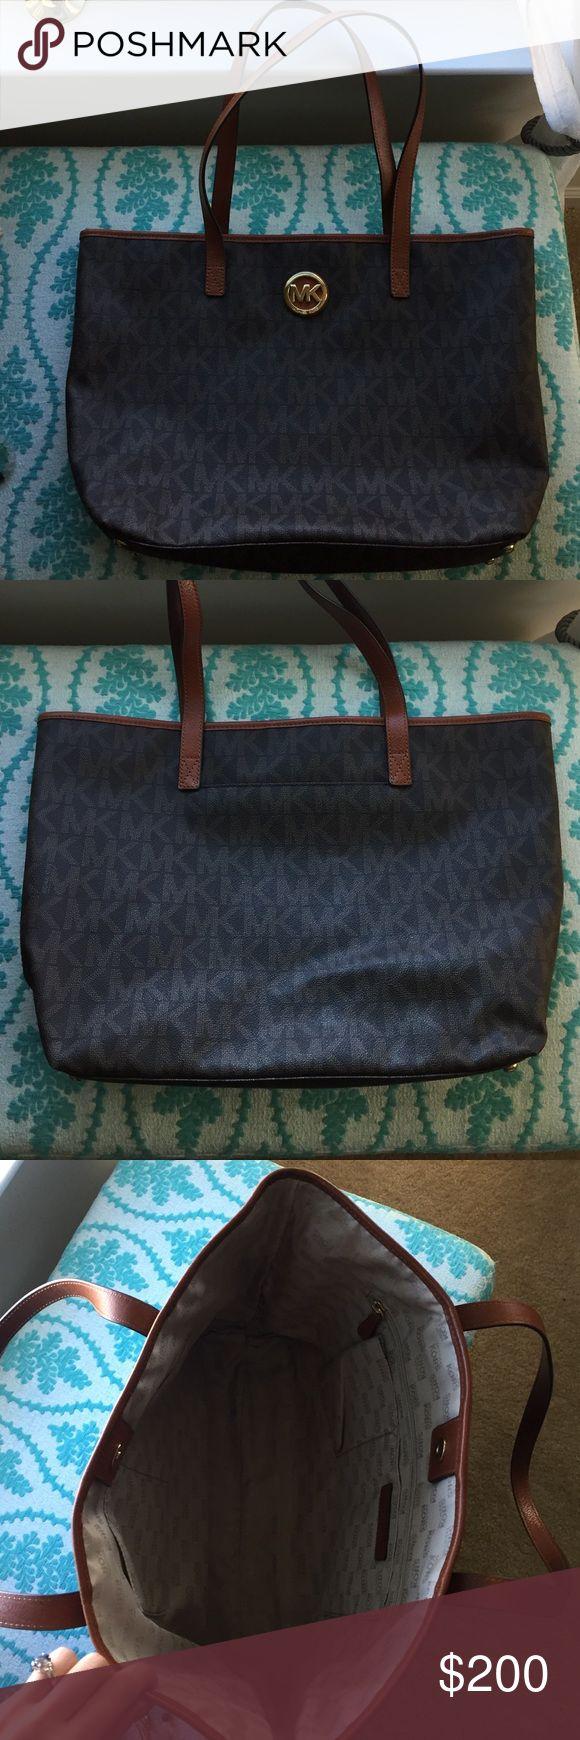 1000 ideas about michael kors diaper bag on pinterest coach diaper bags d. Black Bedroom Furniture Sets. Home Design Ideas